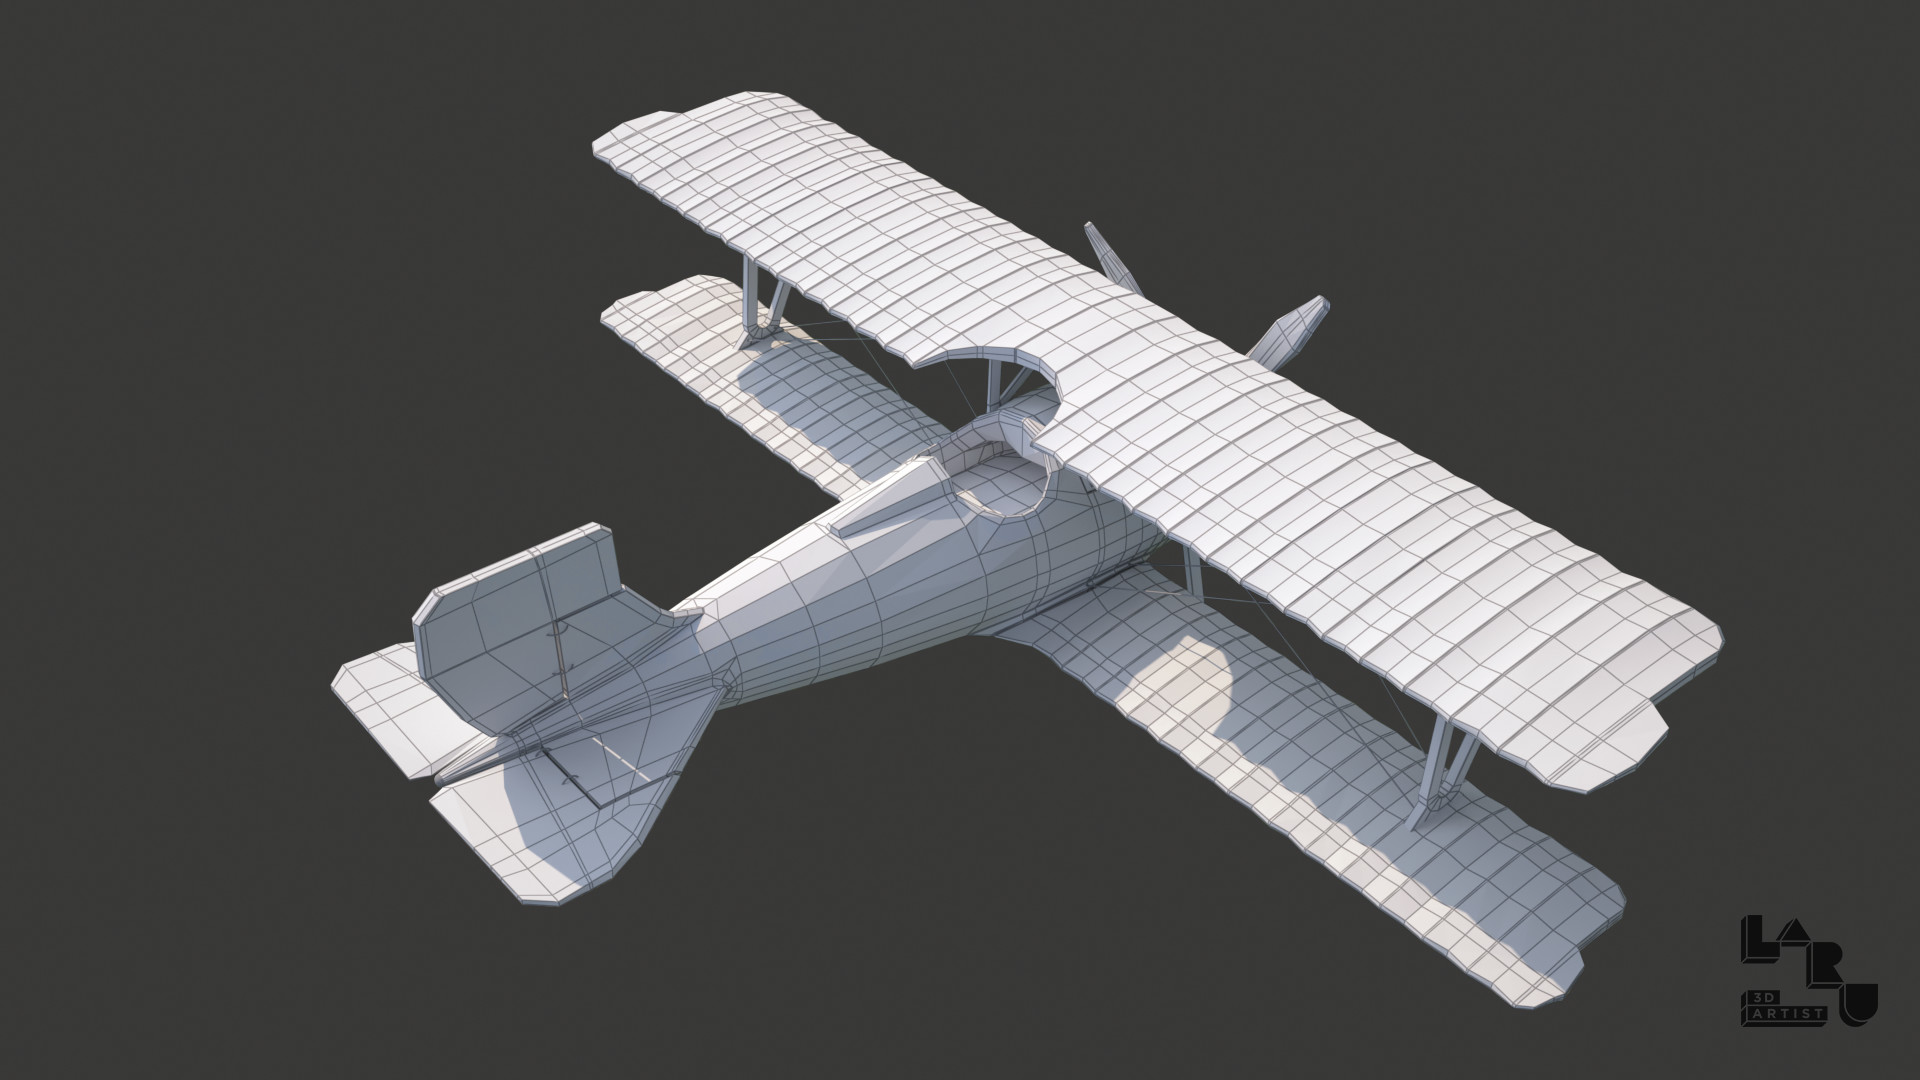 Laru 3d avion2